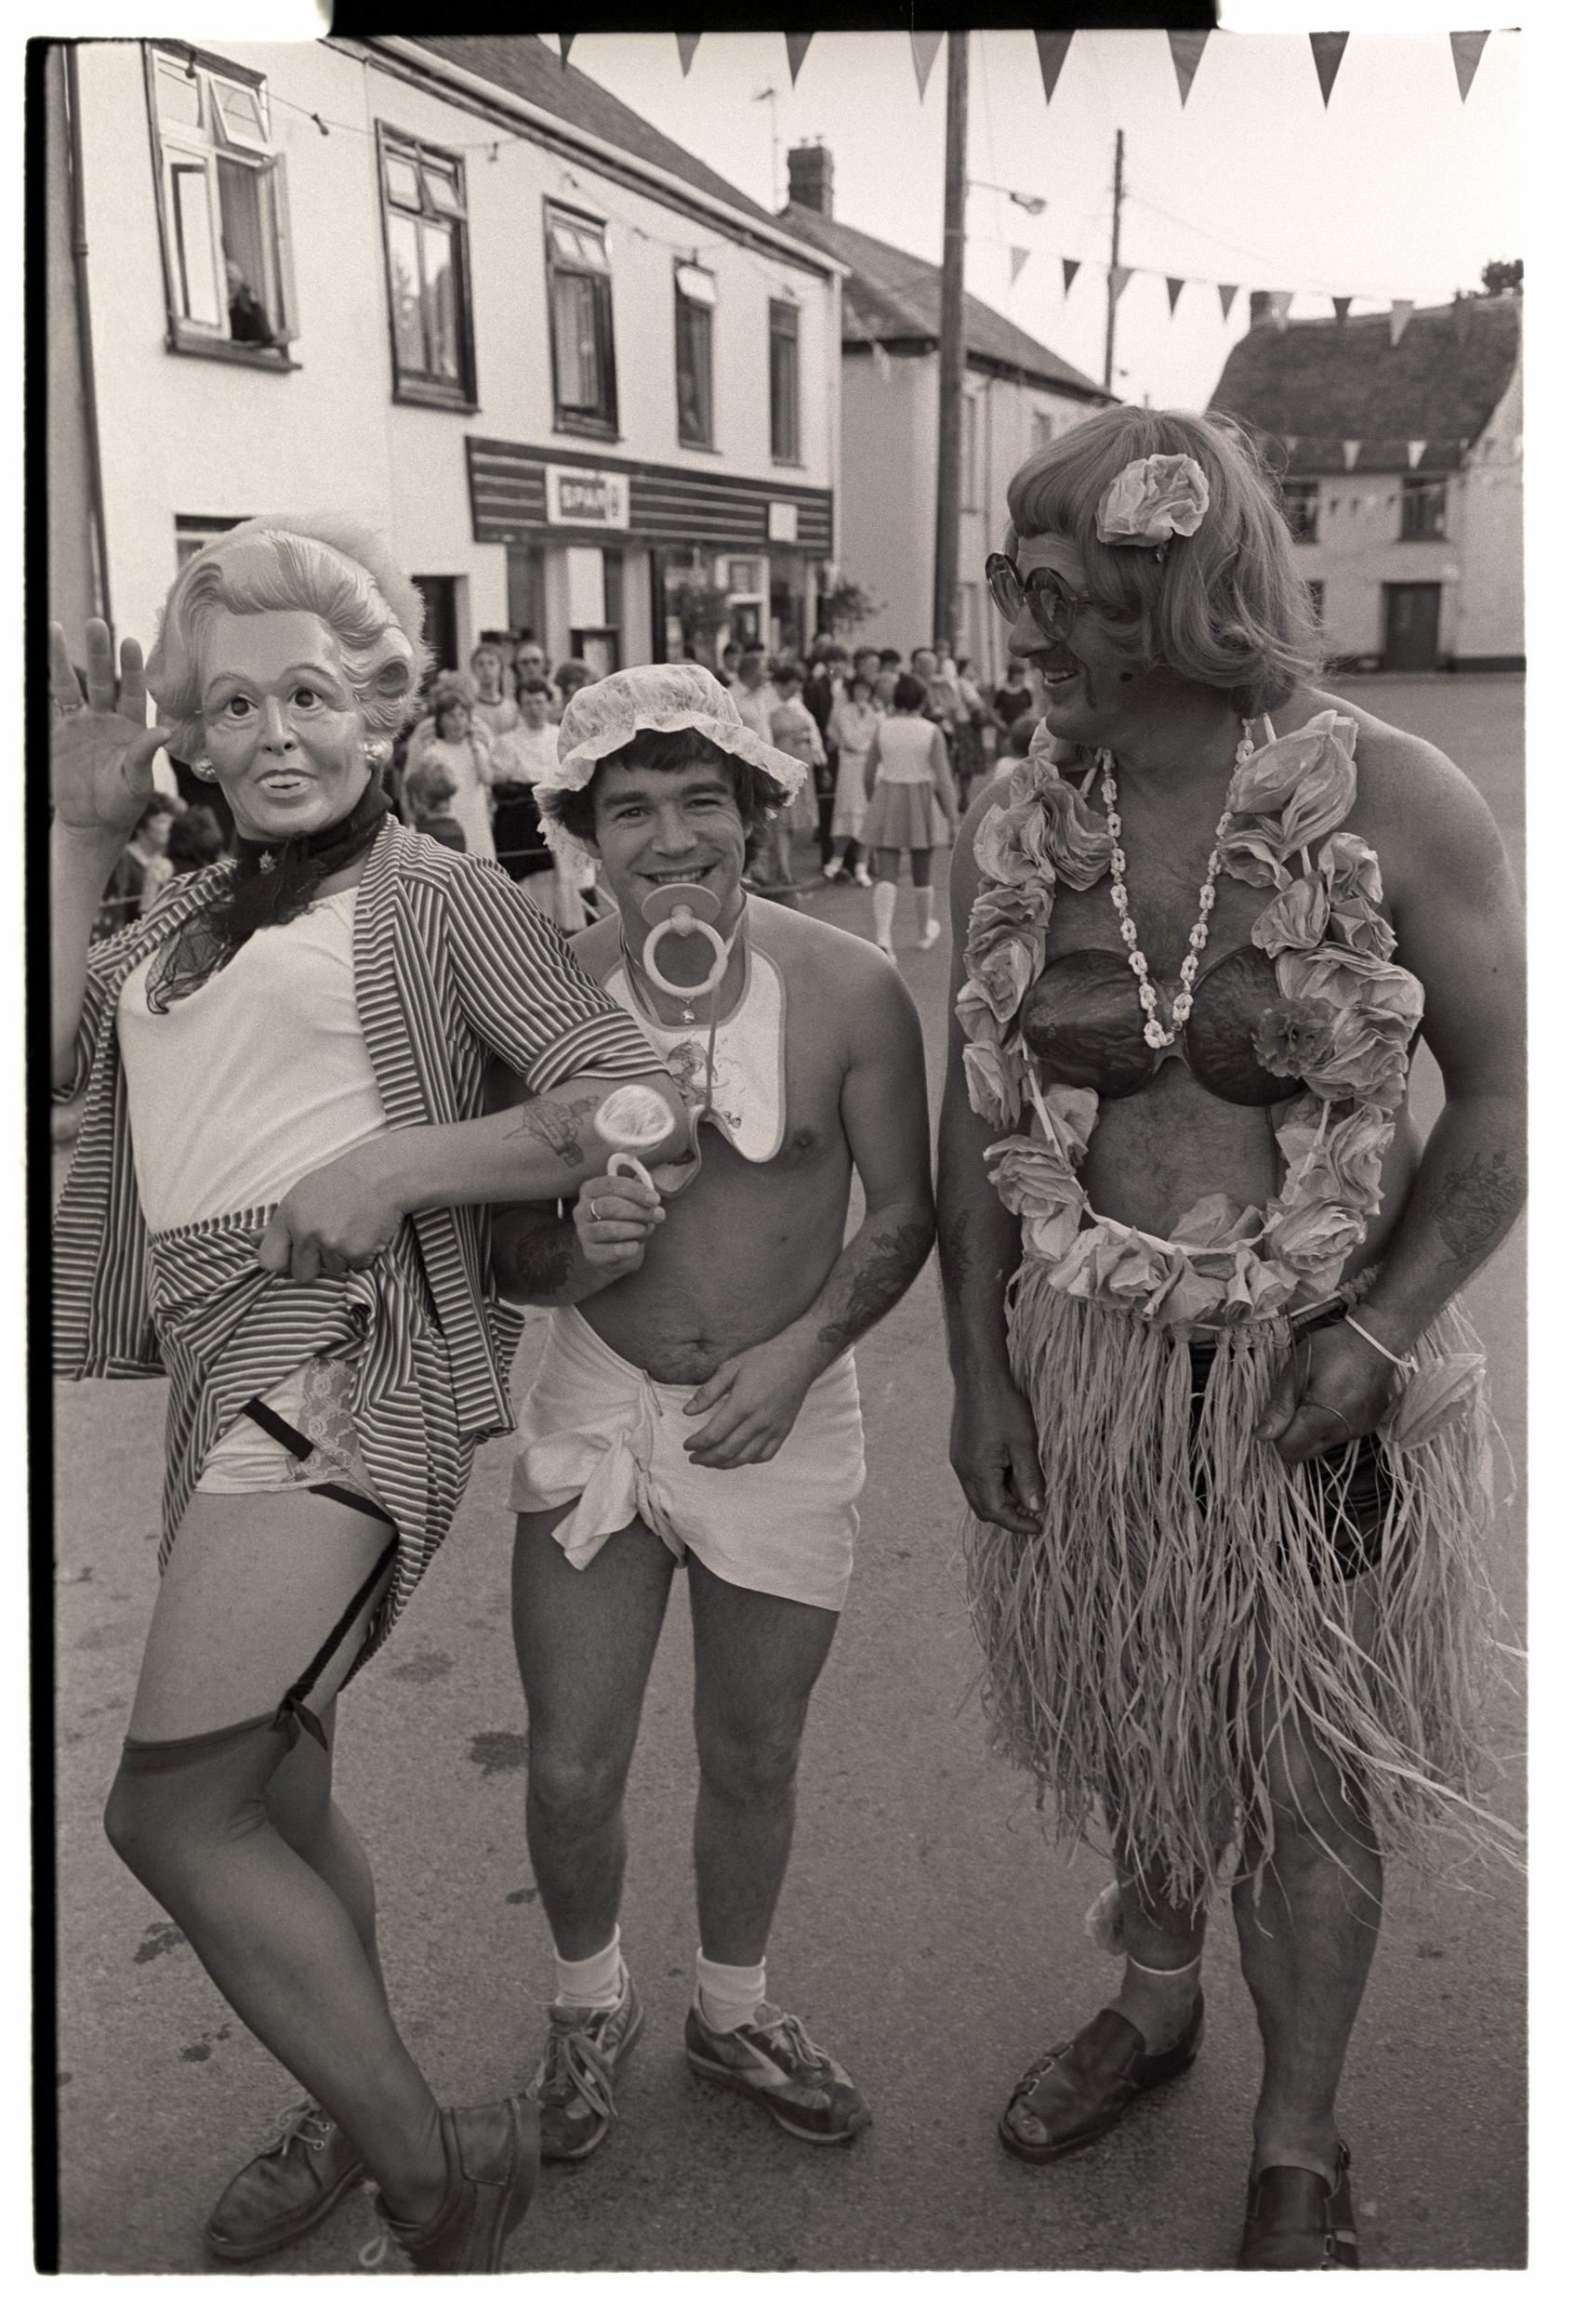 Winkleigh, July 1982